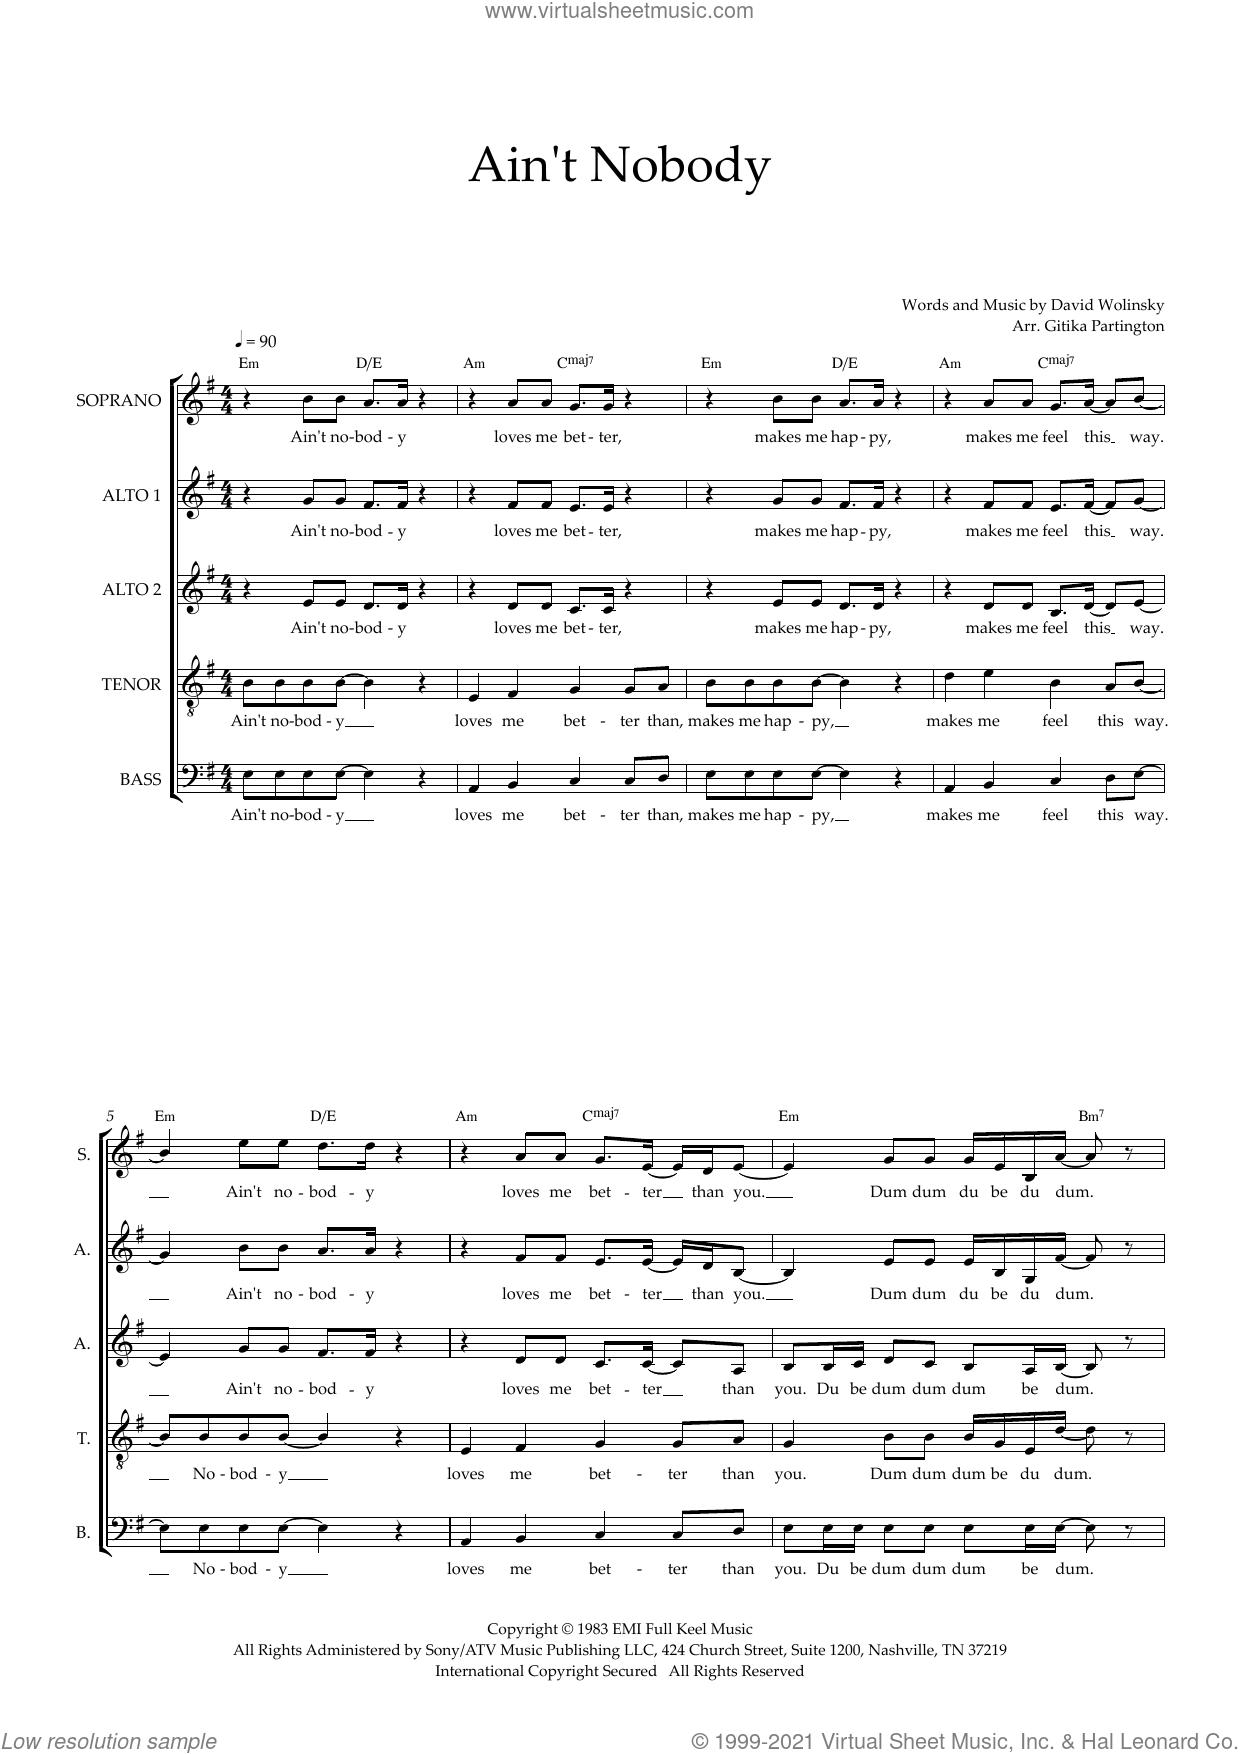 Ain't Nobody (arr. Gitika Partington) sheet music for choir (SAATB) by Chaka Khan, Gitika Partington and David Wolinski, intermediate skill level